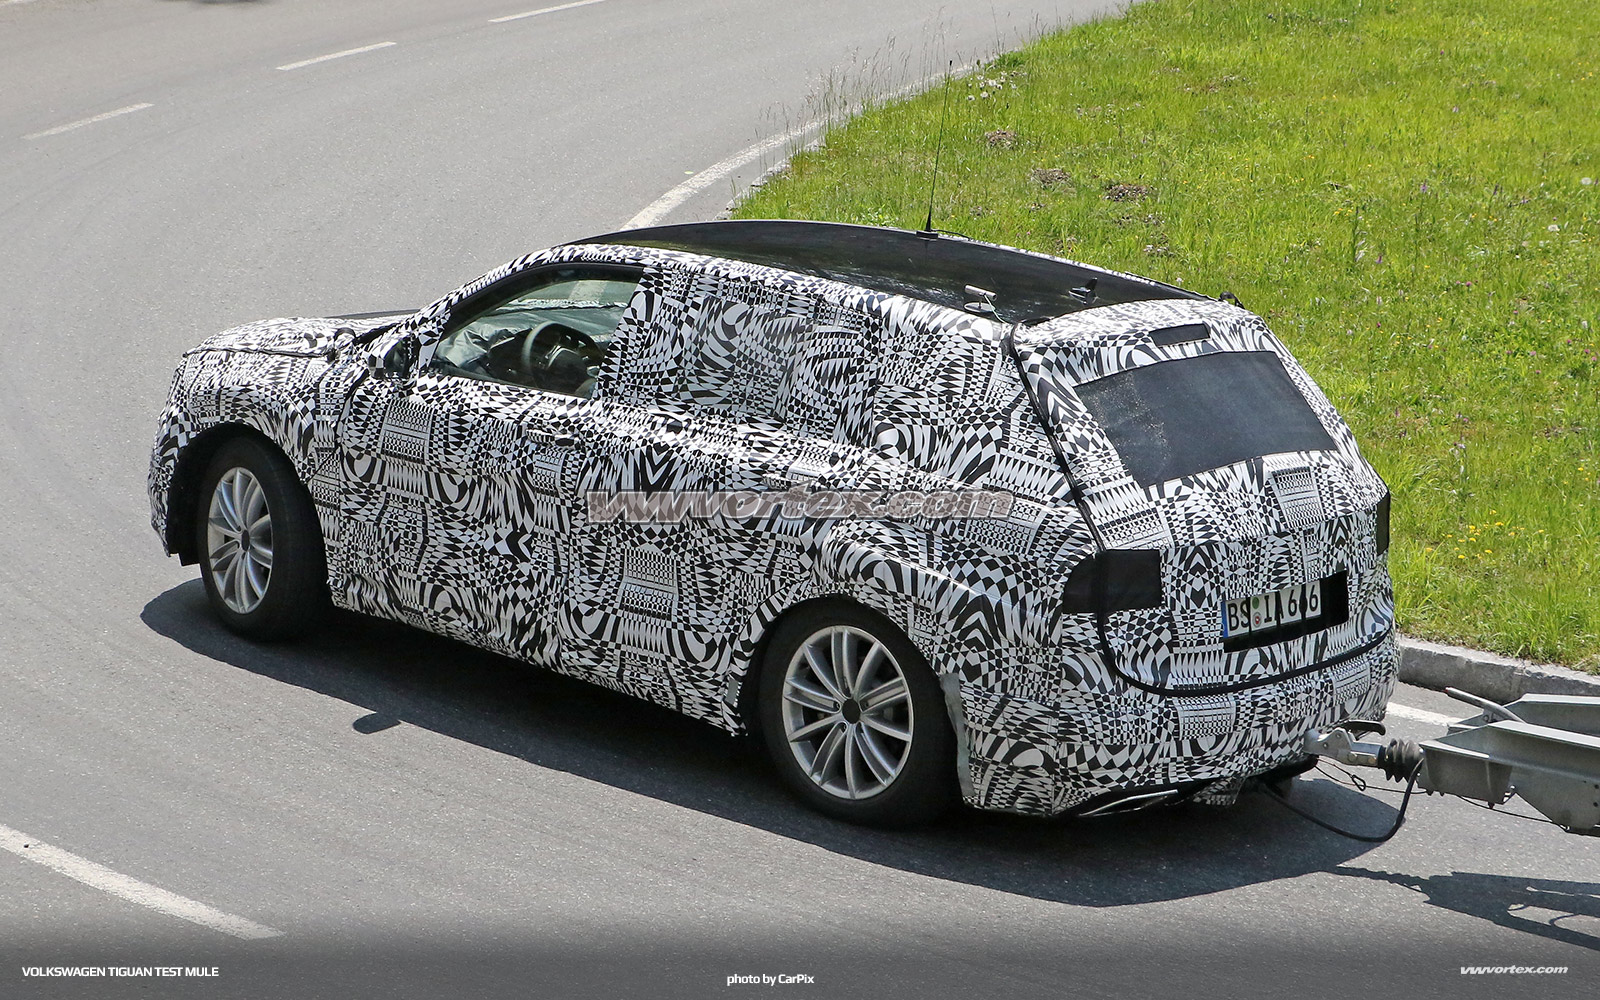 Audi Q2 test mule 4923 960x480 photo